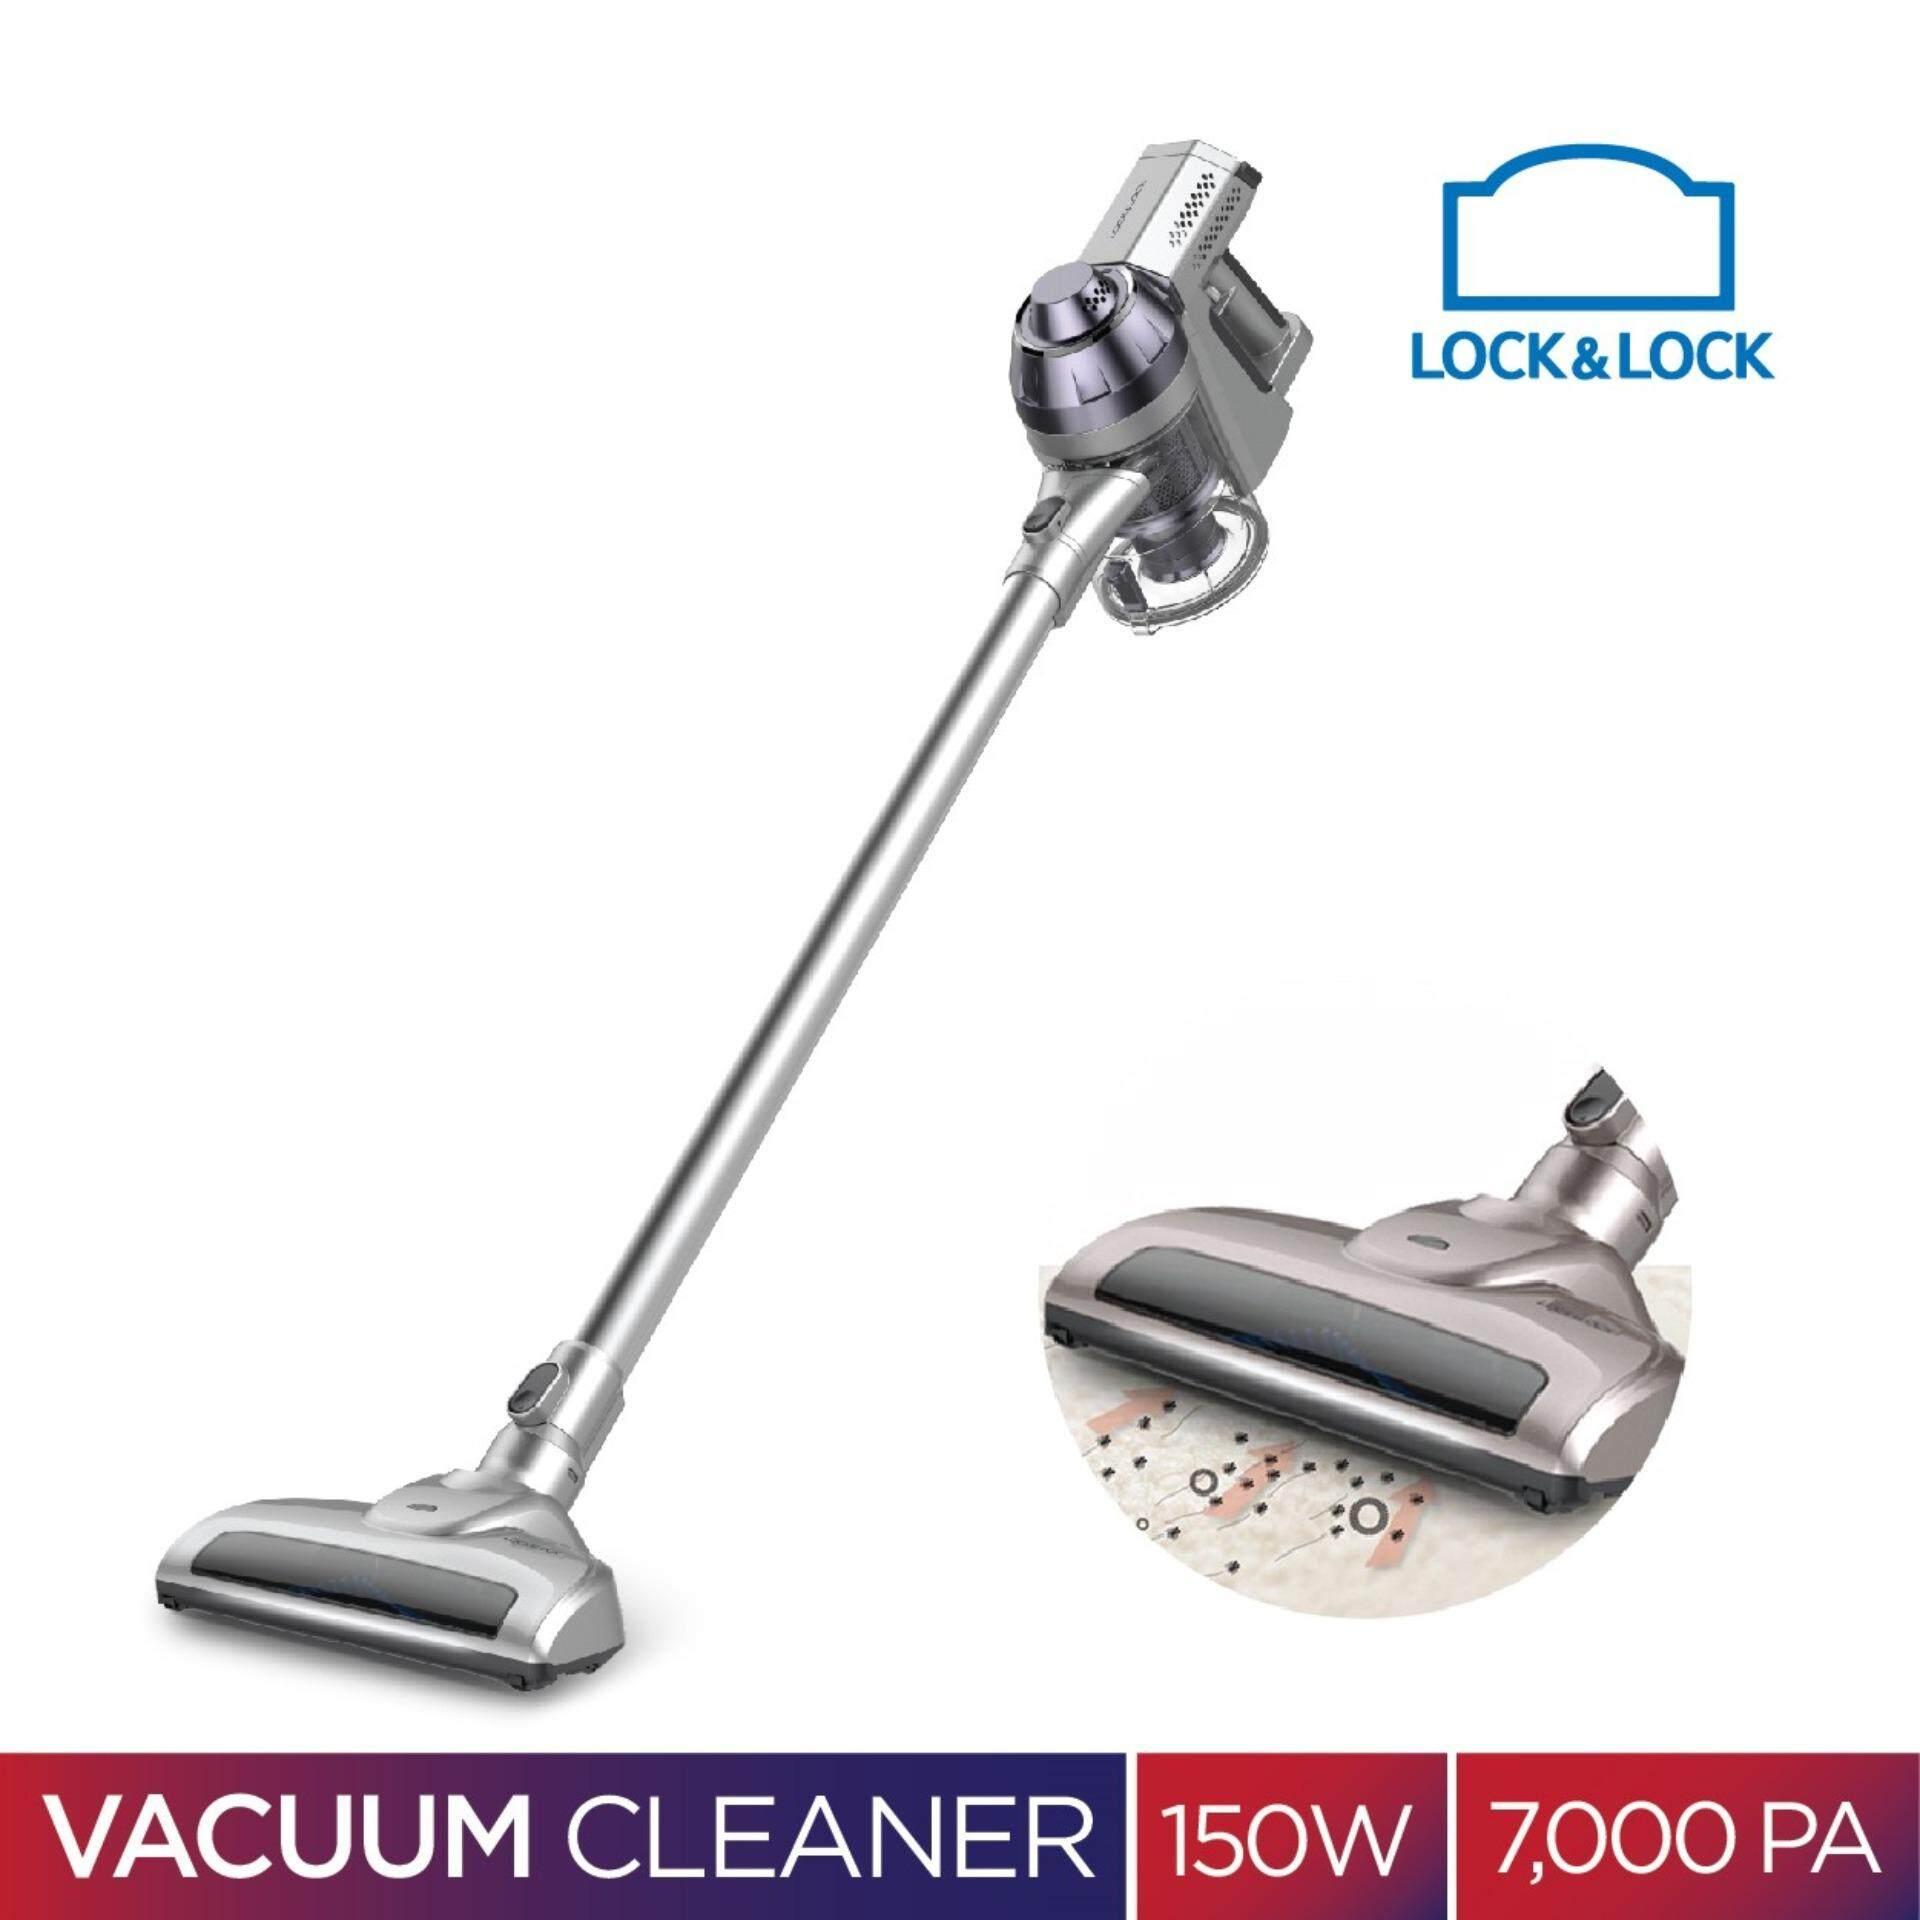 LOCK&LOCK Cordless Vacuum Cleaner เครื่องดูดฝุ่นไร้สาย น้ำหนักเบา ขนาด 150 วัตต์ 100-240 โวลต์ รุ่น ENV111